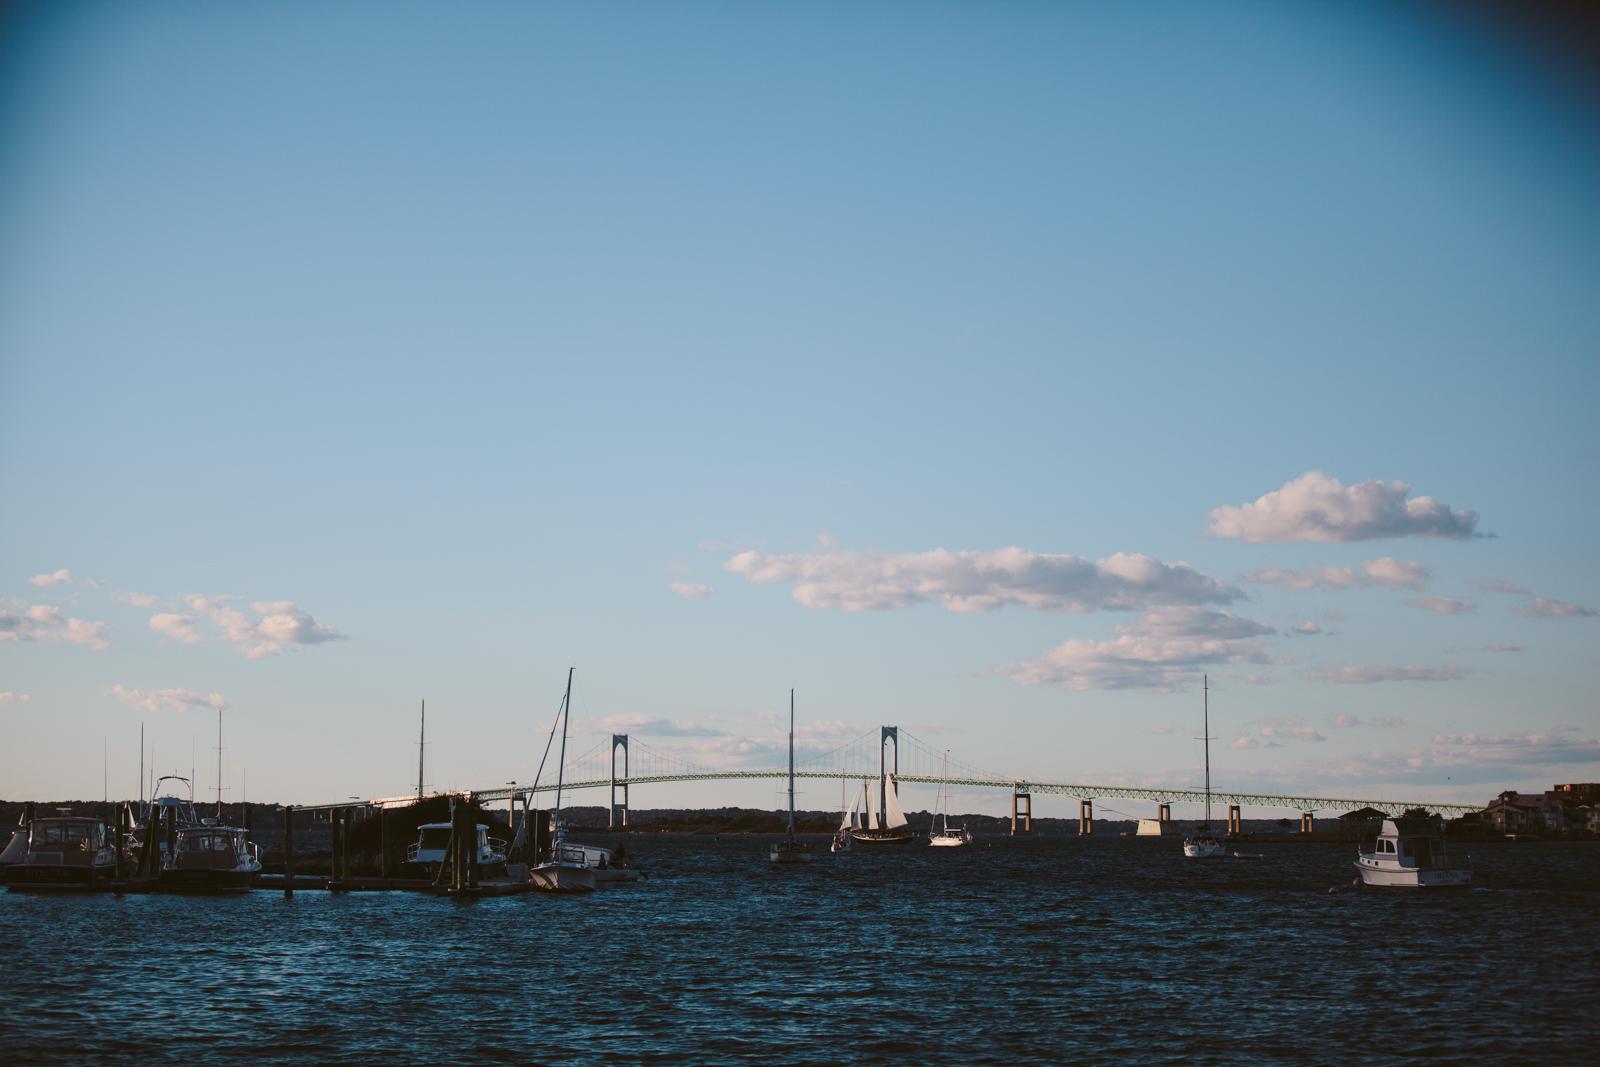 Eastons-Beach-Rotunda-Ballroom-Wedding-Newport-Rhode-Island-PhotographybyAmandaMorgan-77.jpg